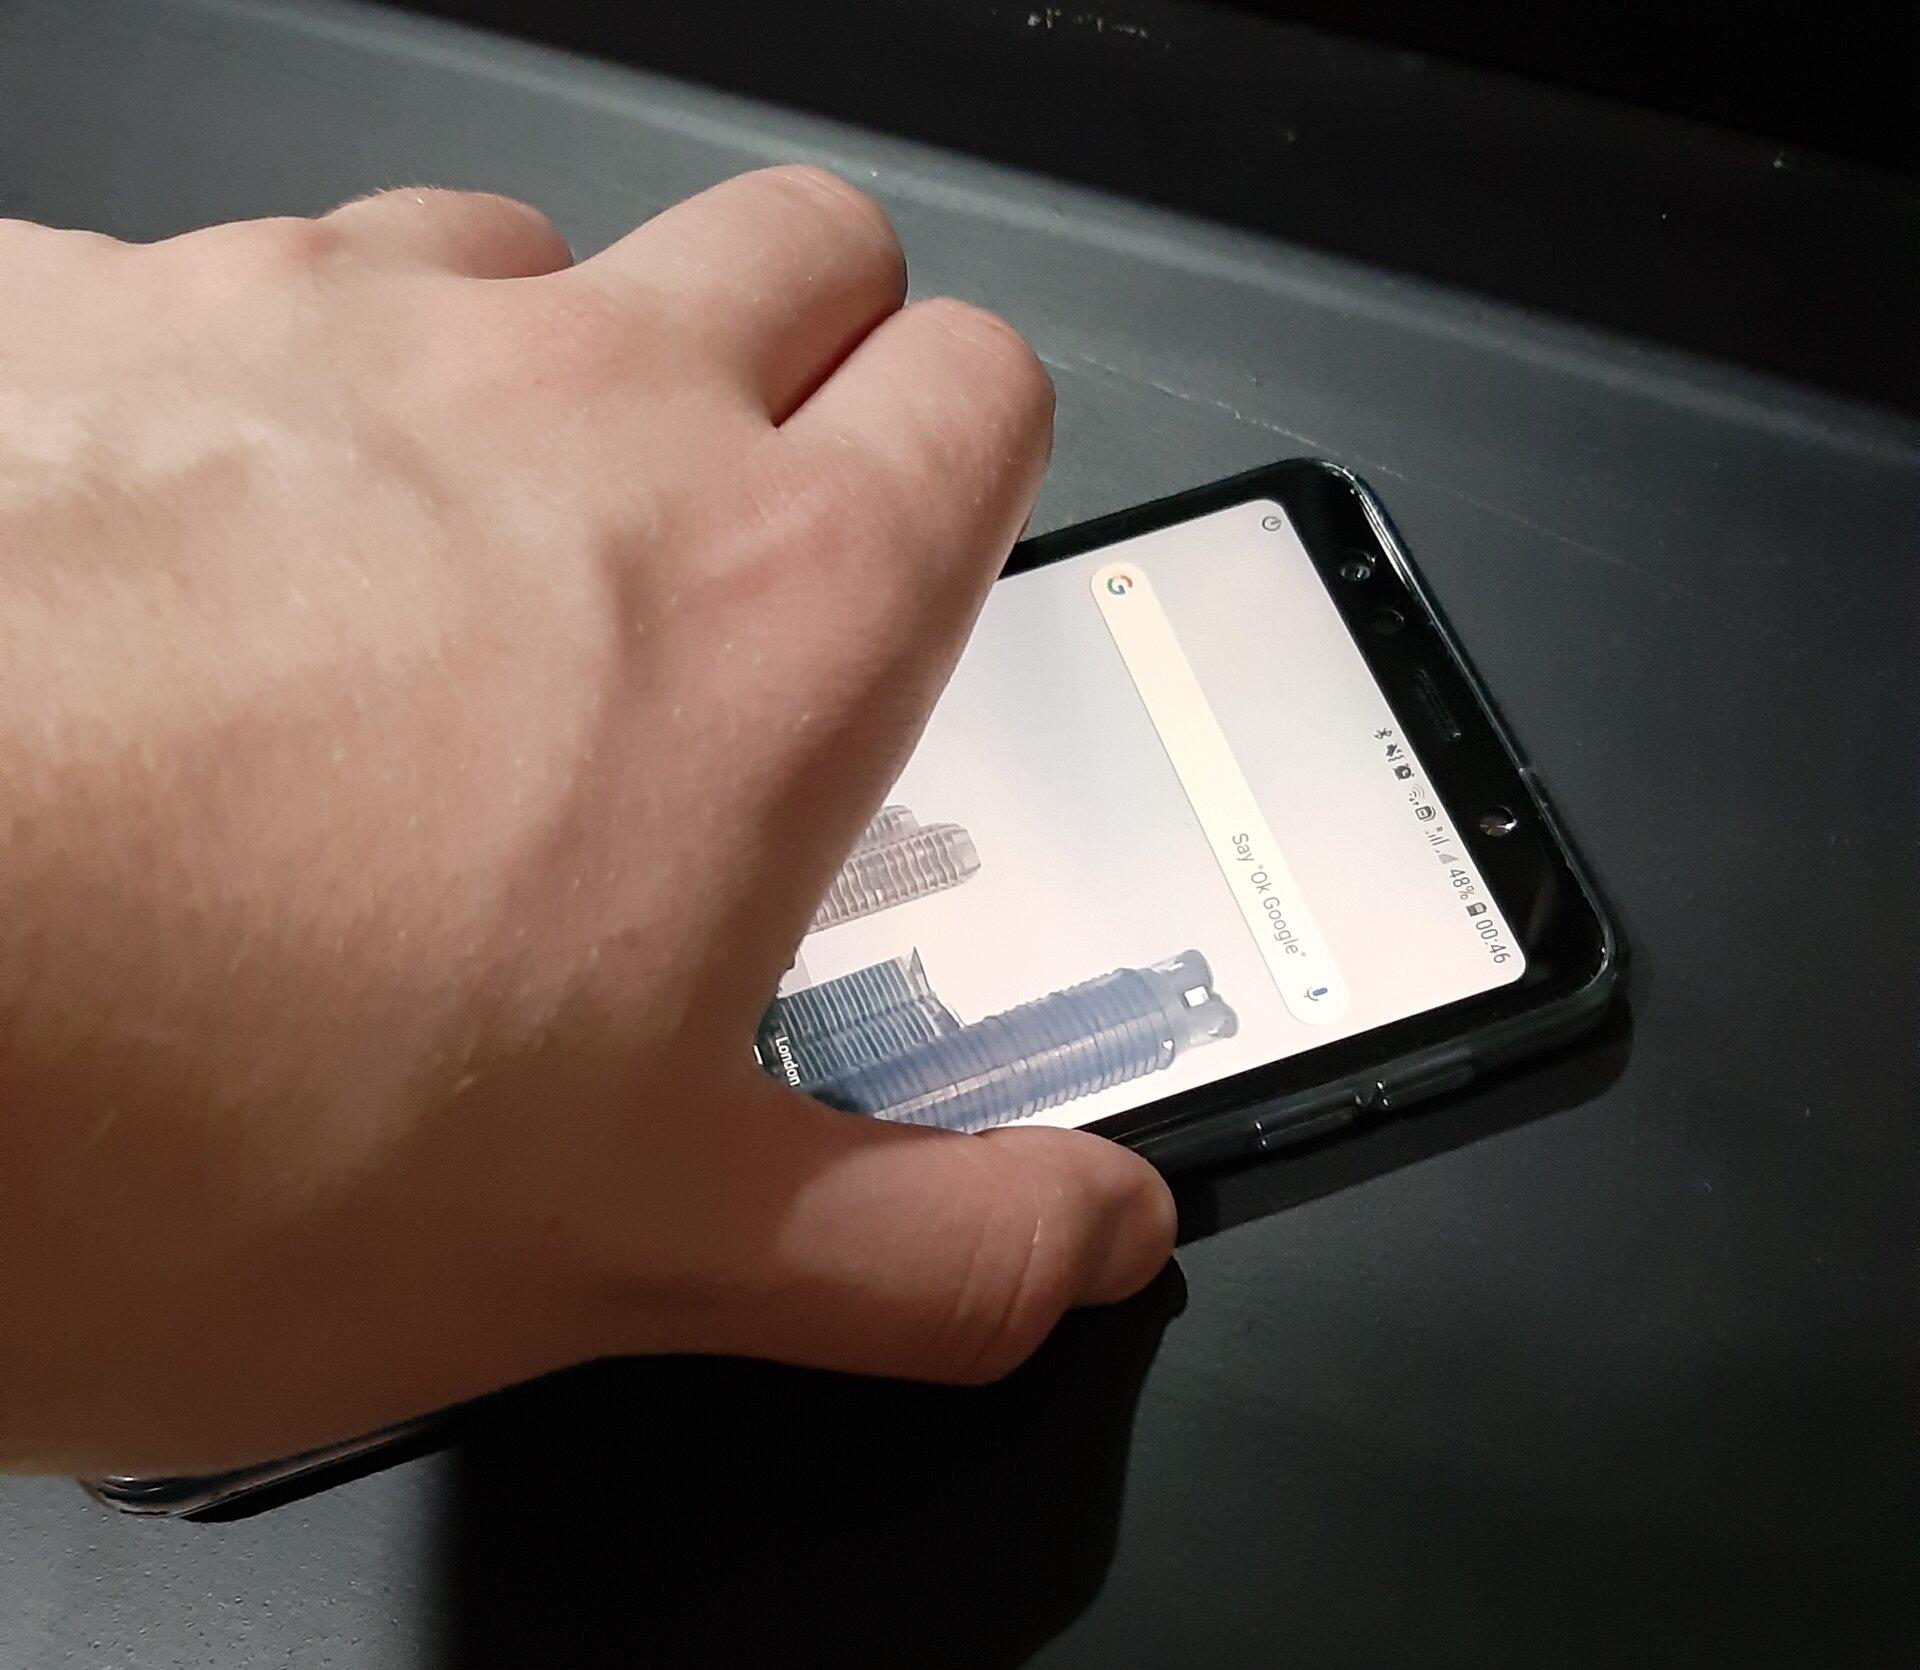 Samsung Galaxy A7 turned on by fingerprint.